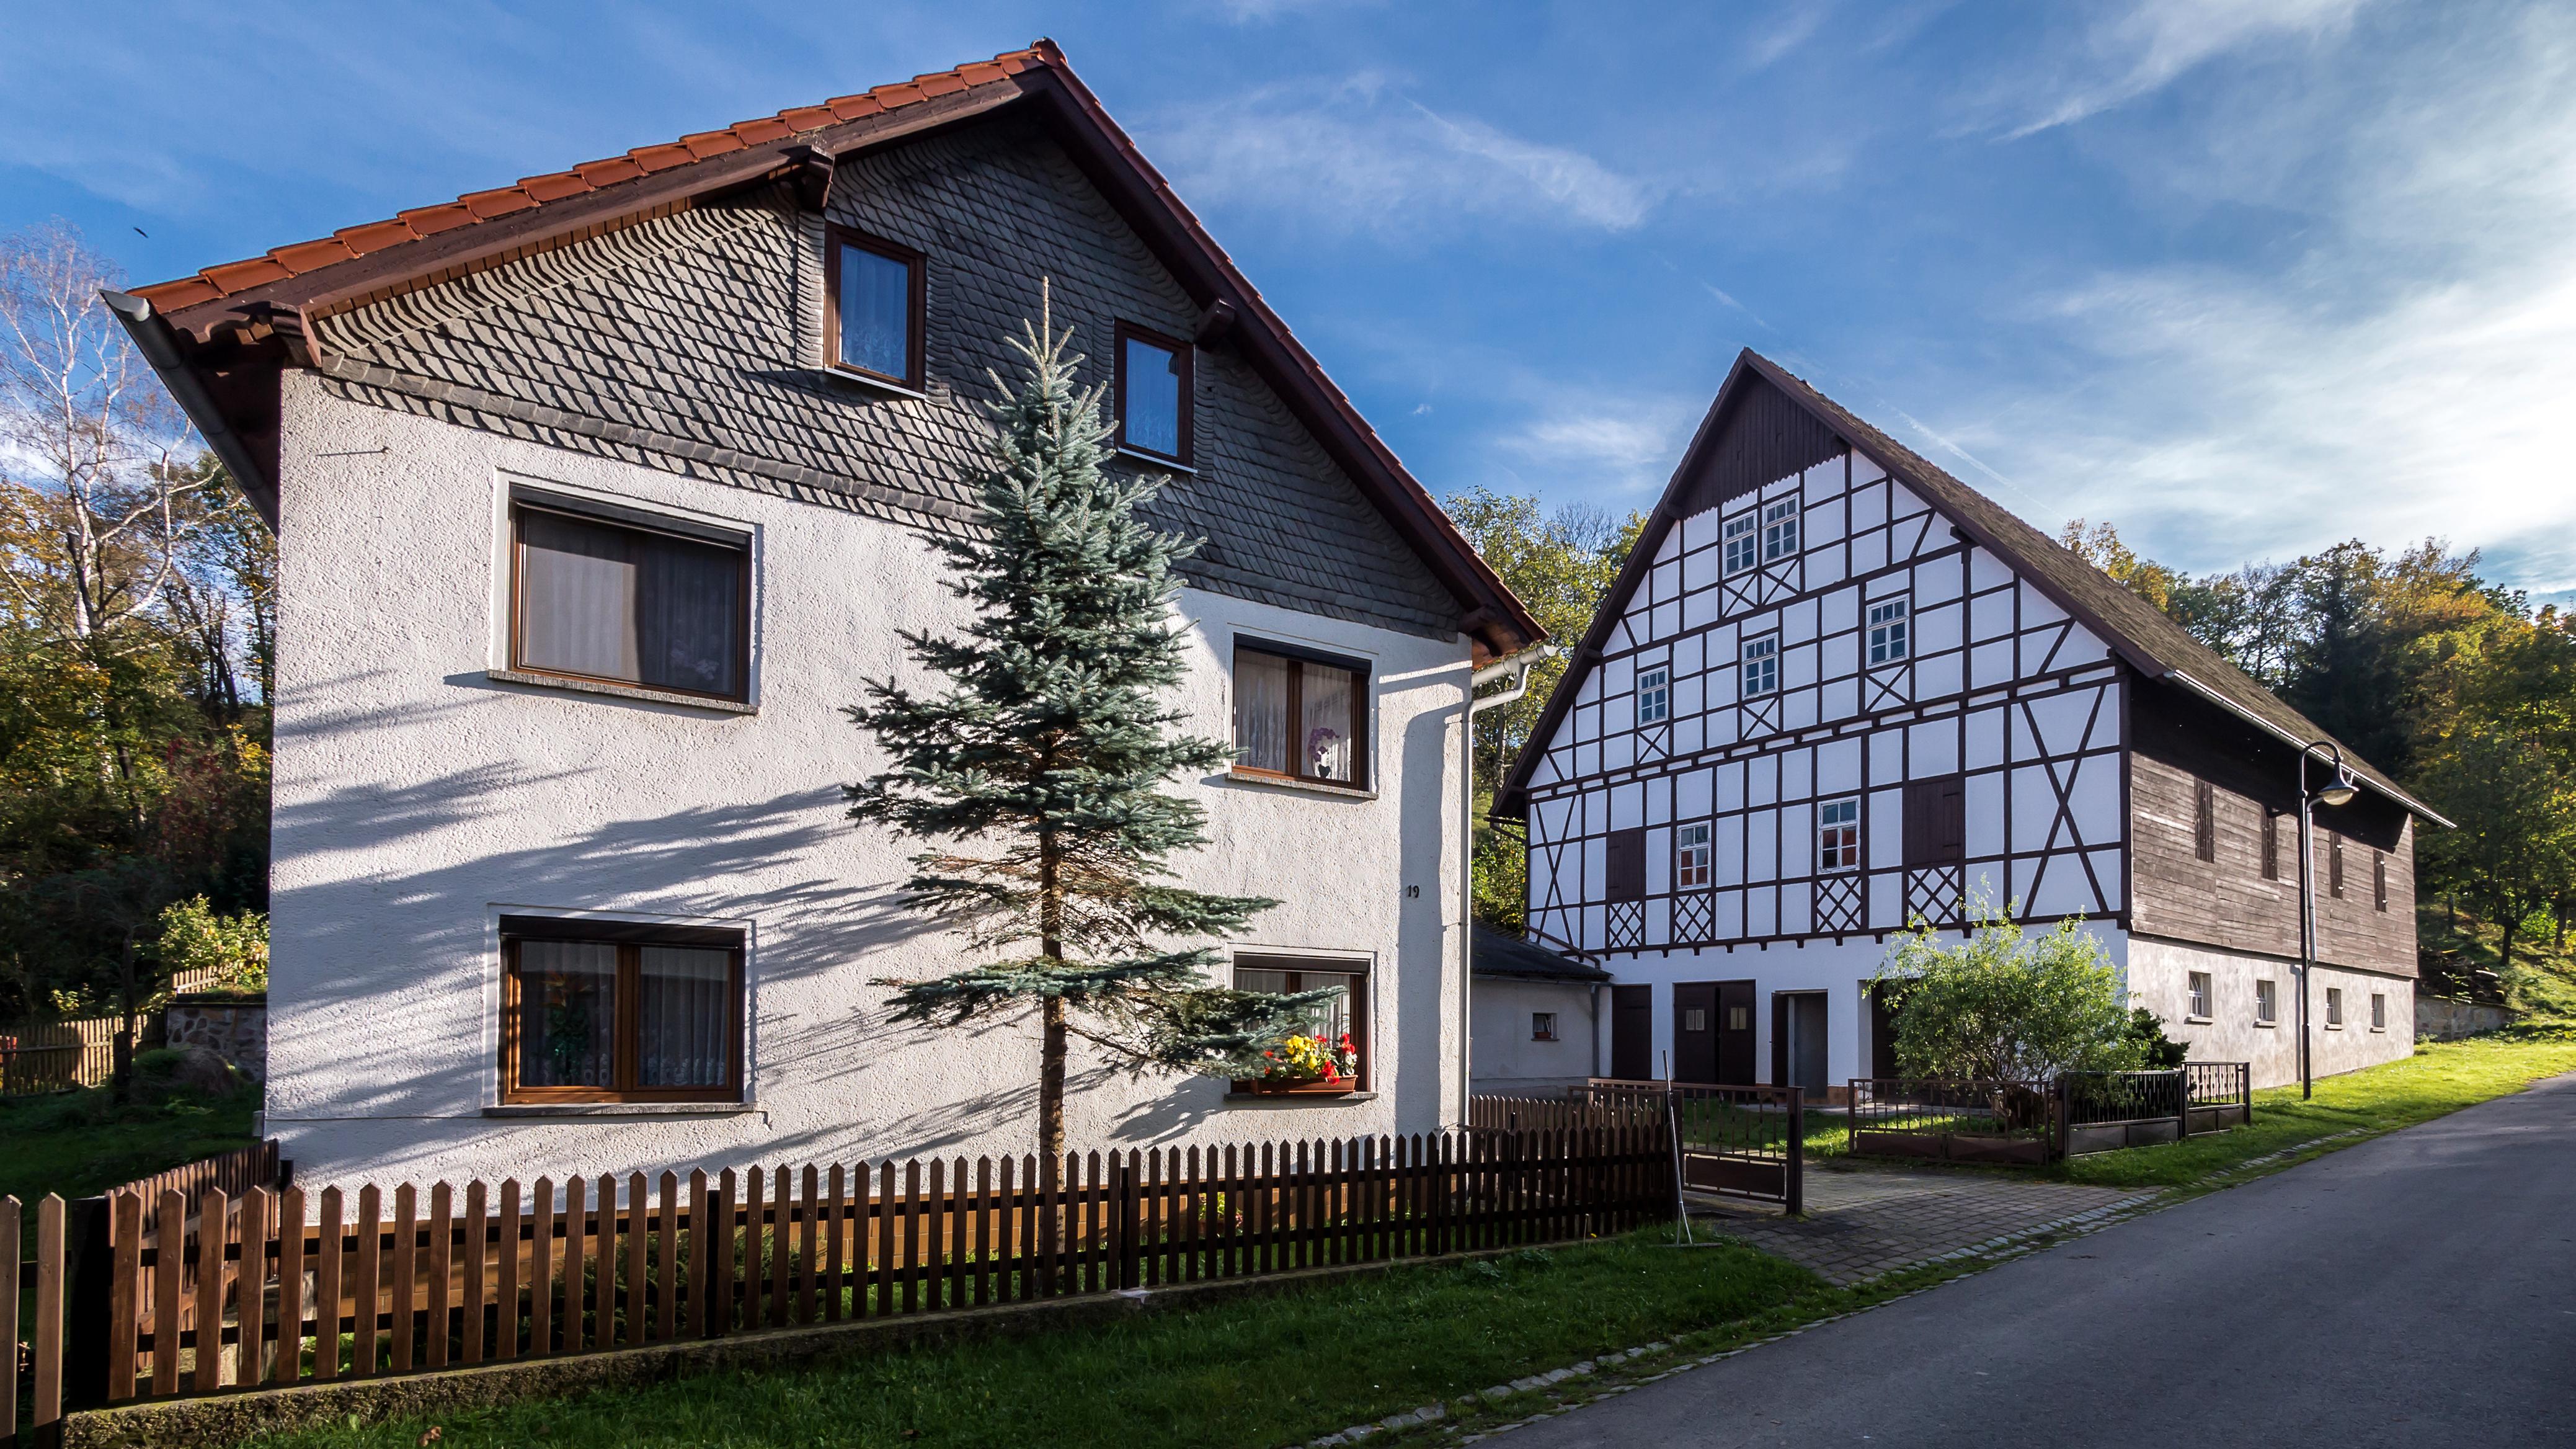 File Weischwitz Haus Nr 19 Scheune Jpg Wikimedia Commons